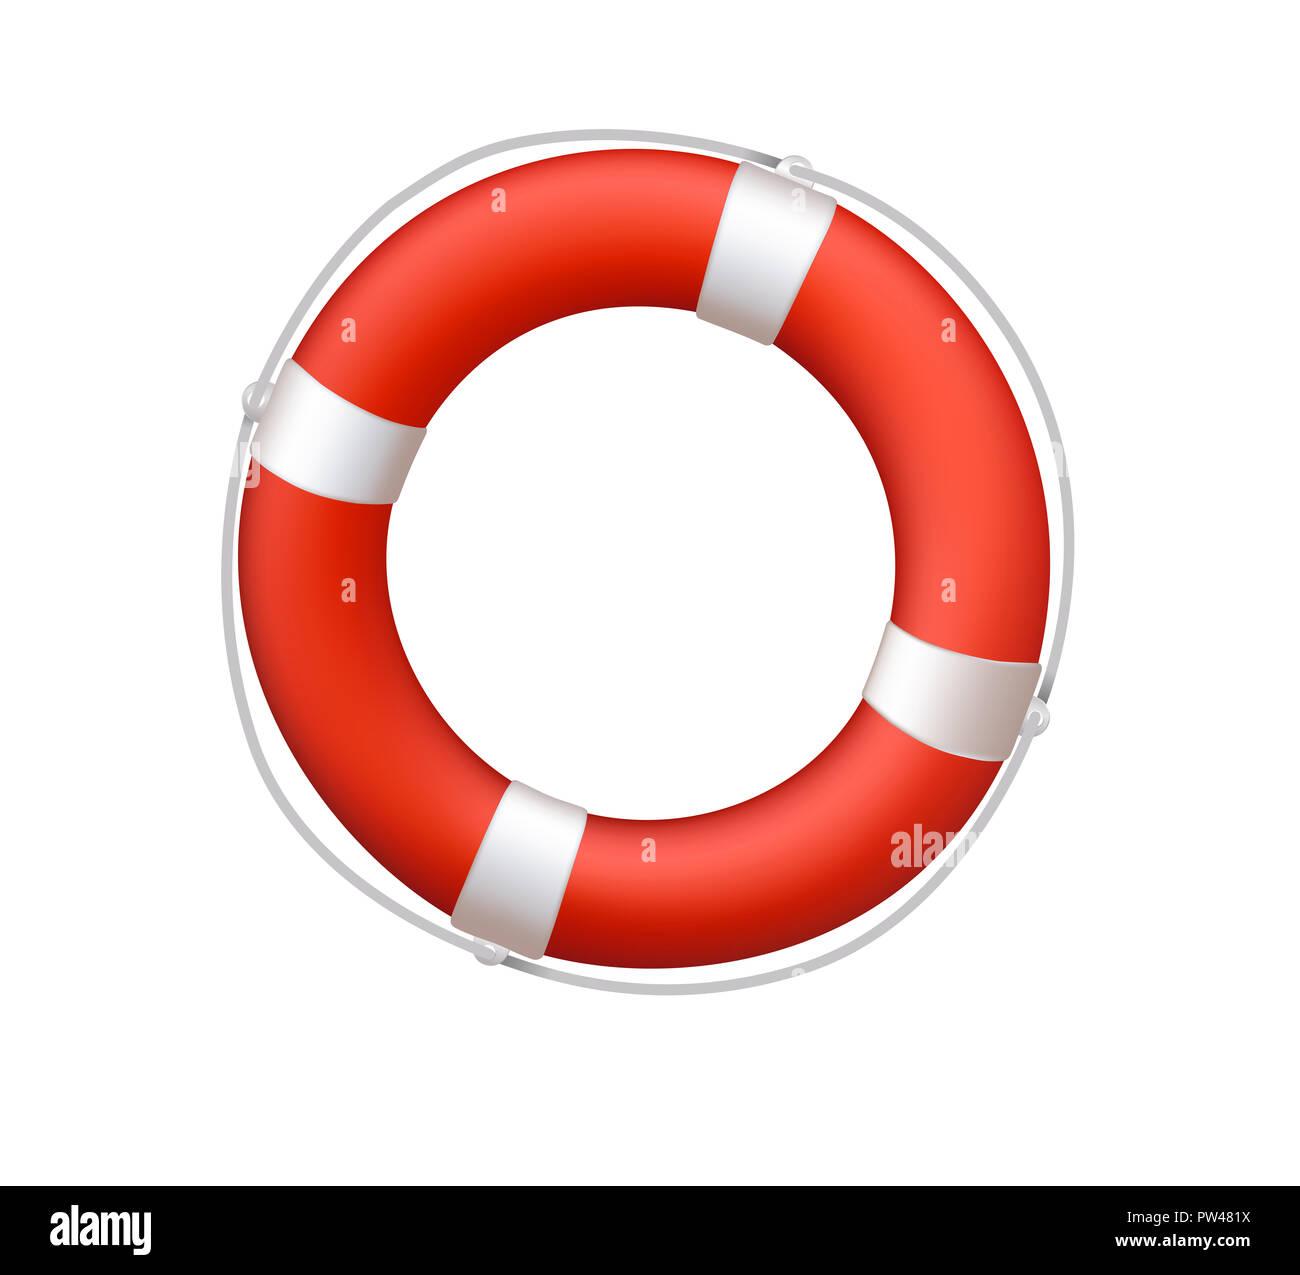 c98b2d46e61e life belt buoy float lifesaver rescue nautical illustration - Stock Image